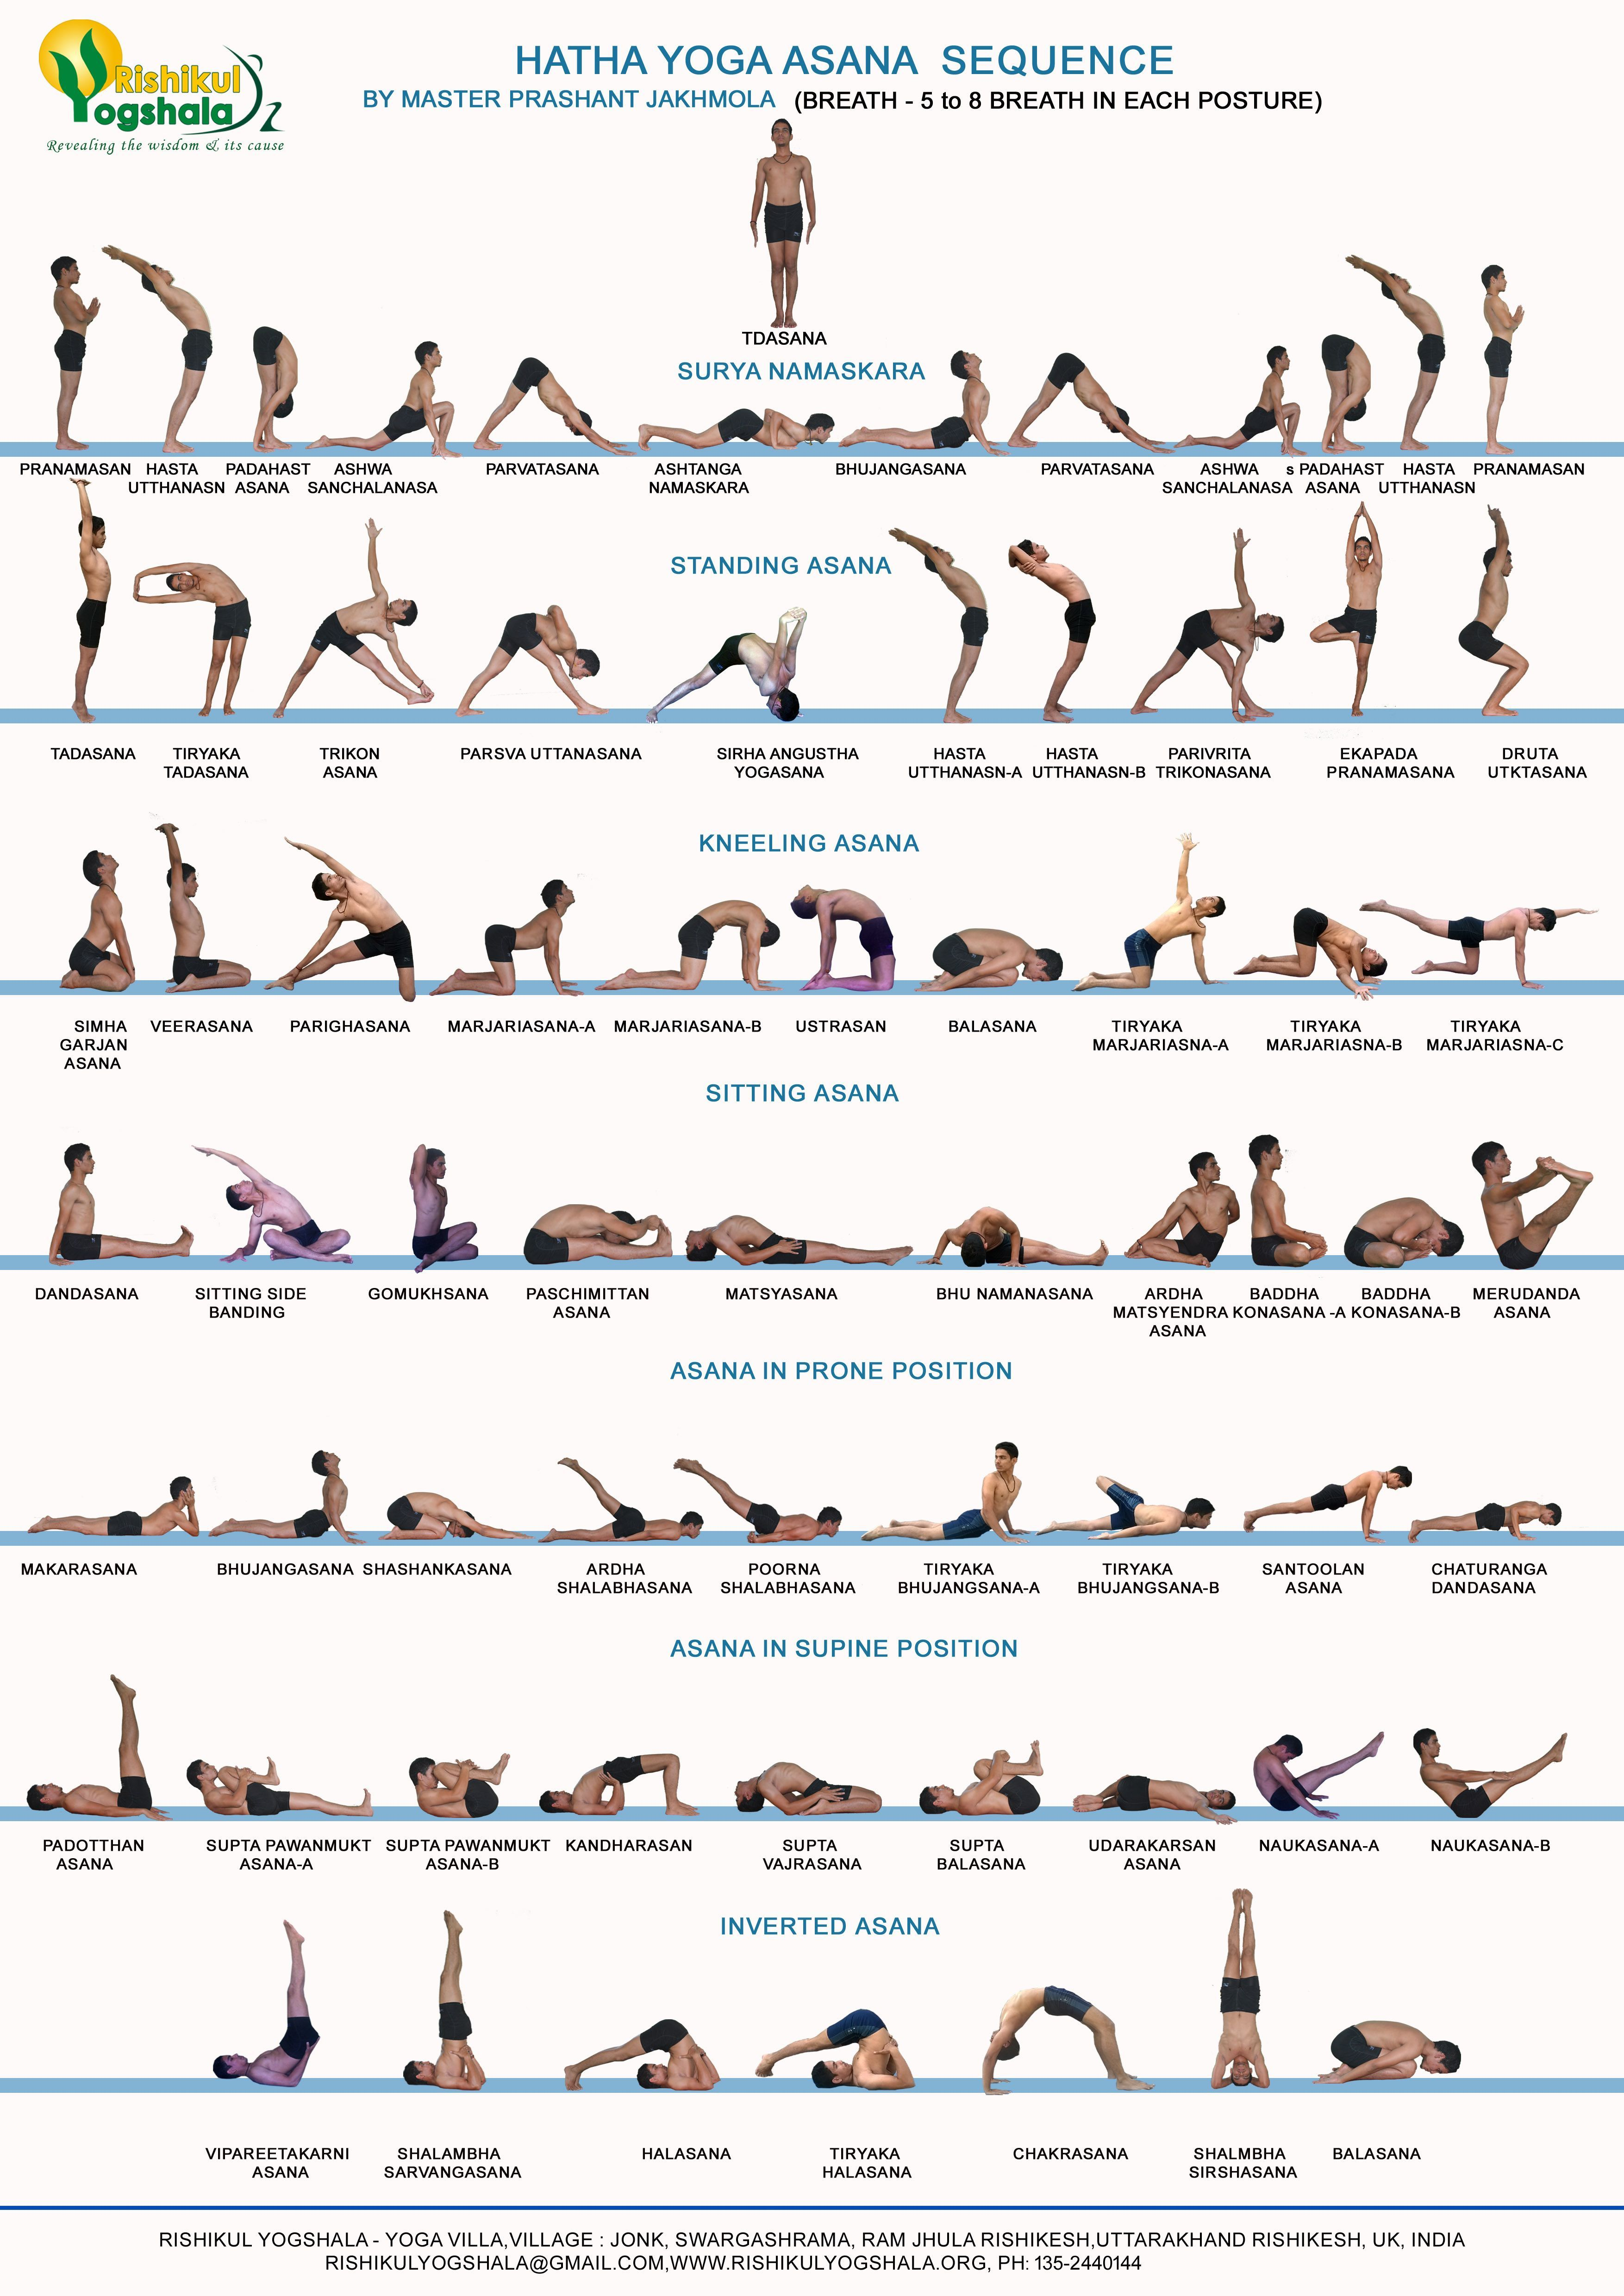 Hatha Yoga Primary Series By Yogi Prashant Hatha Yoga Training India